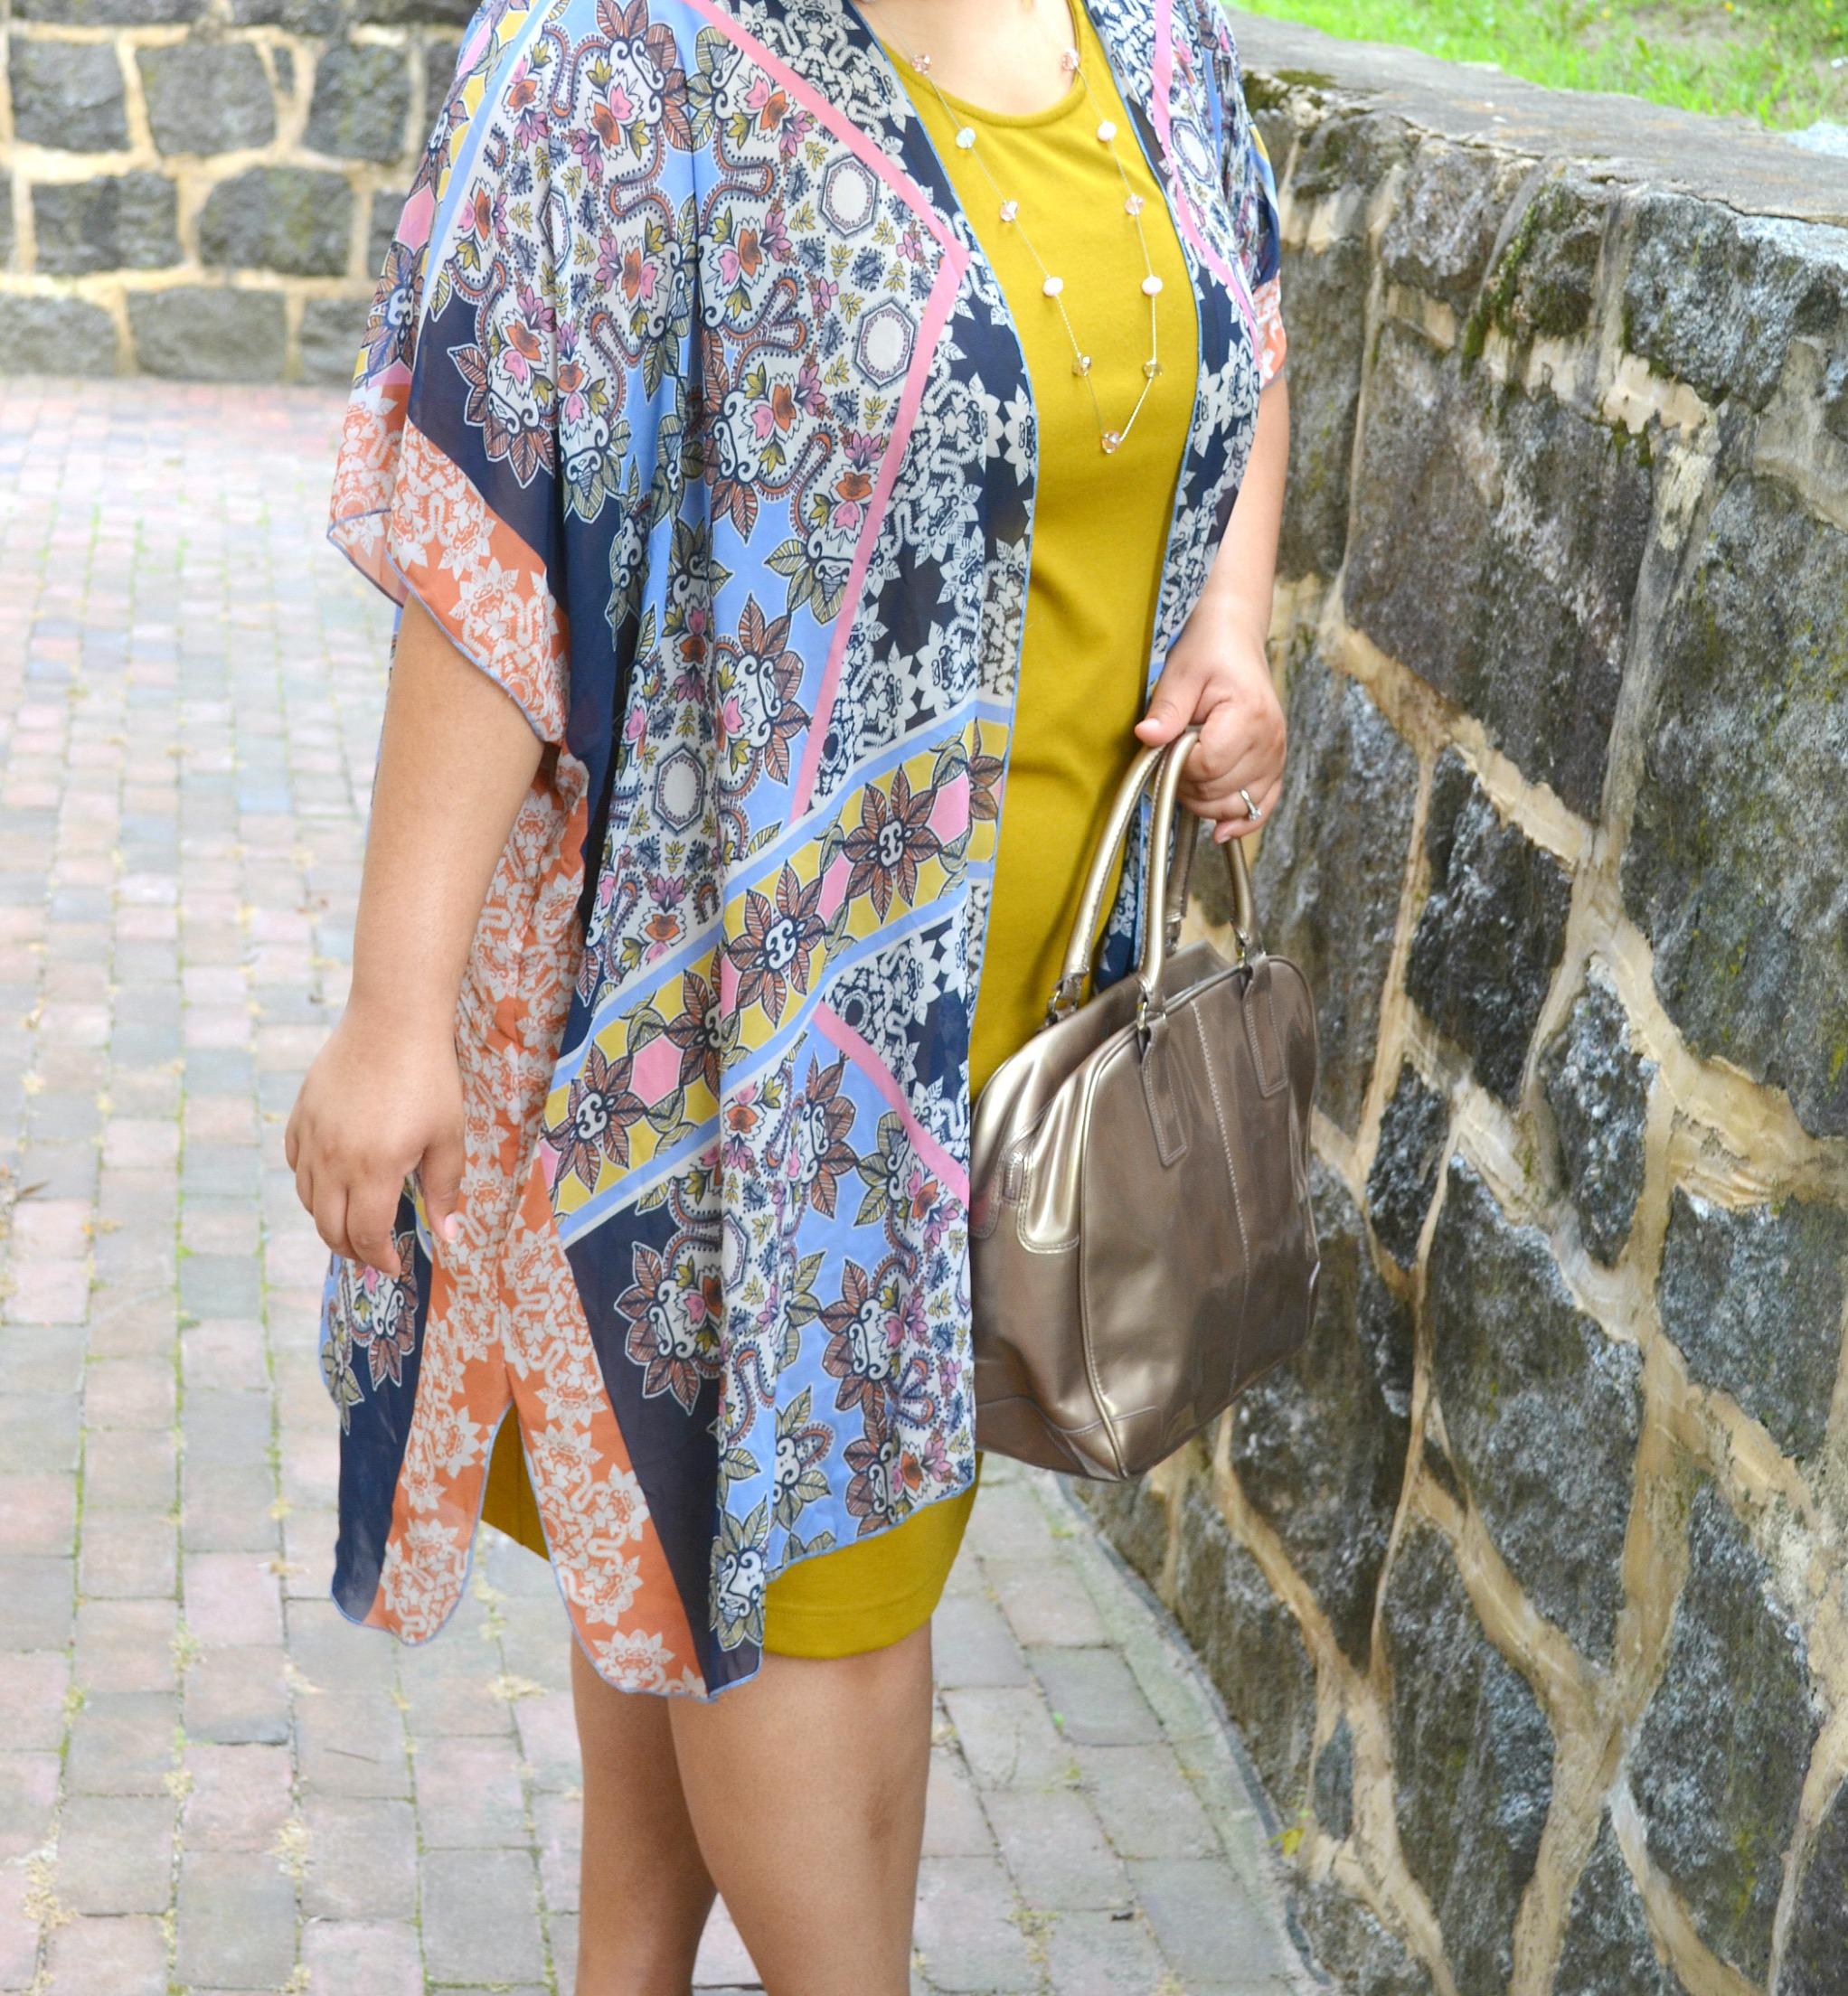 Wearing Kimonos